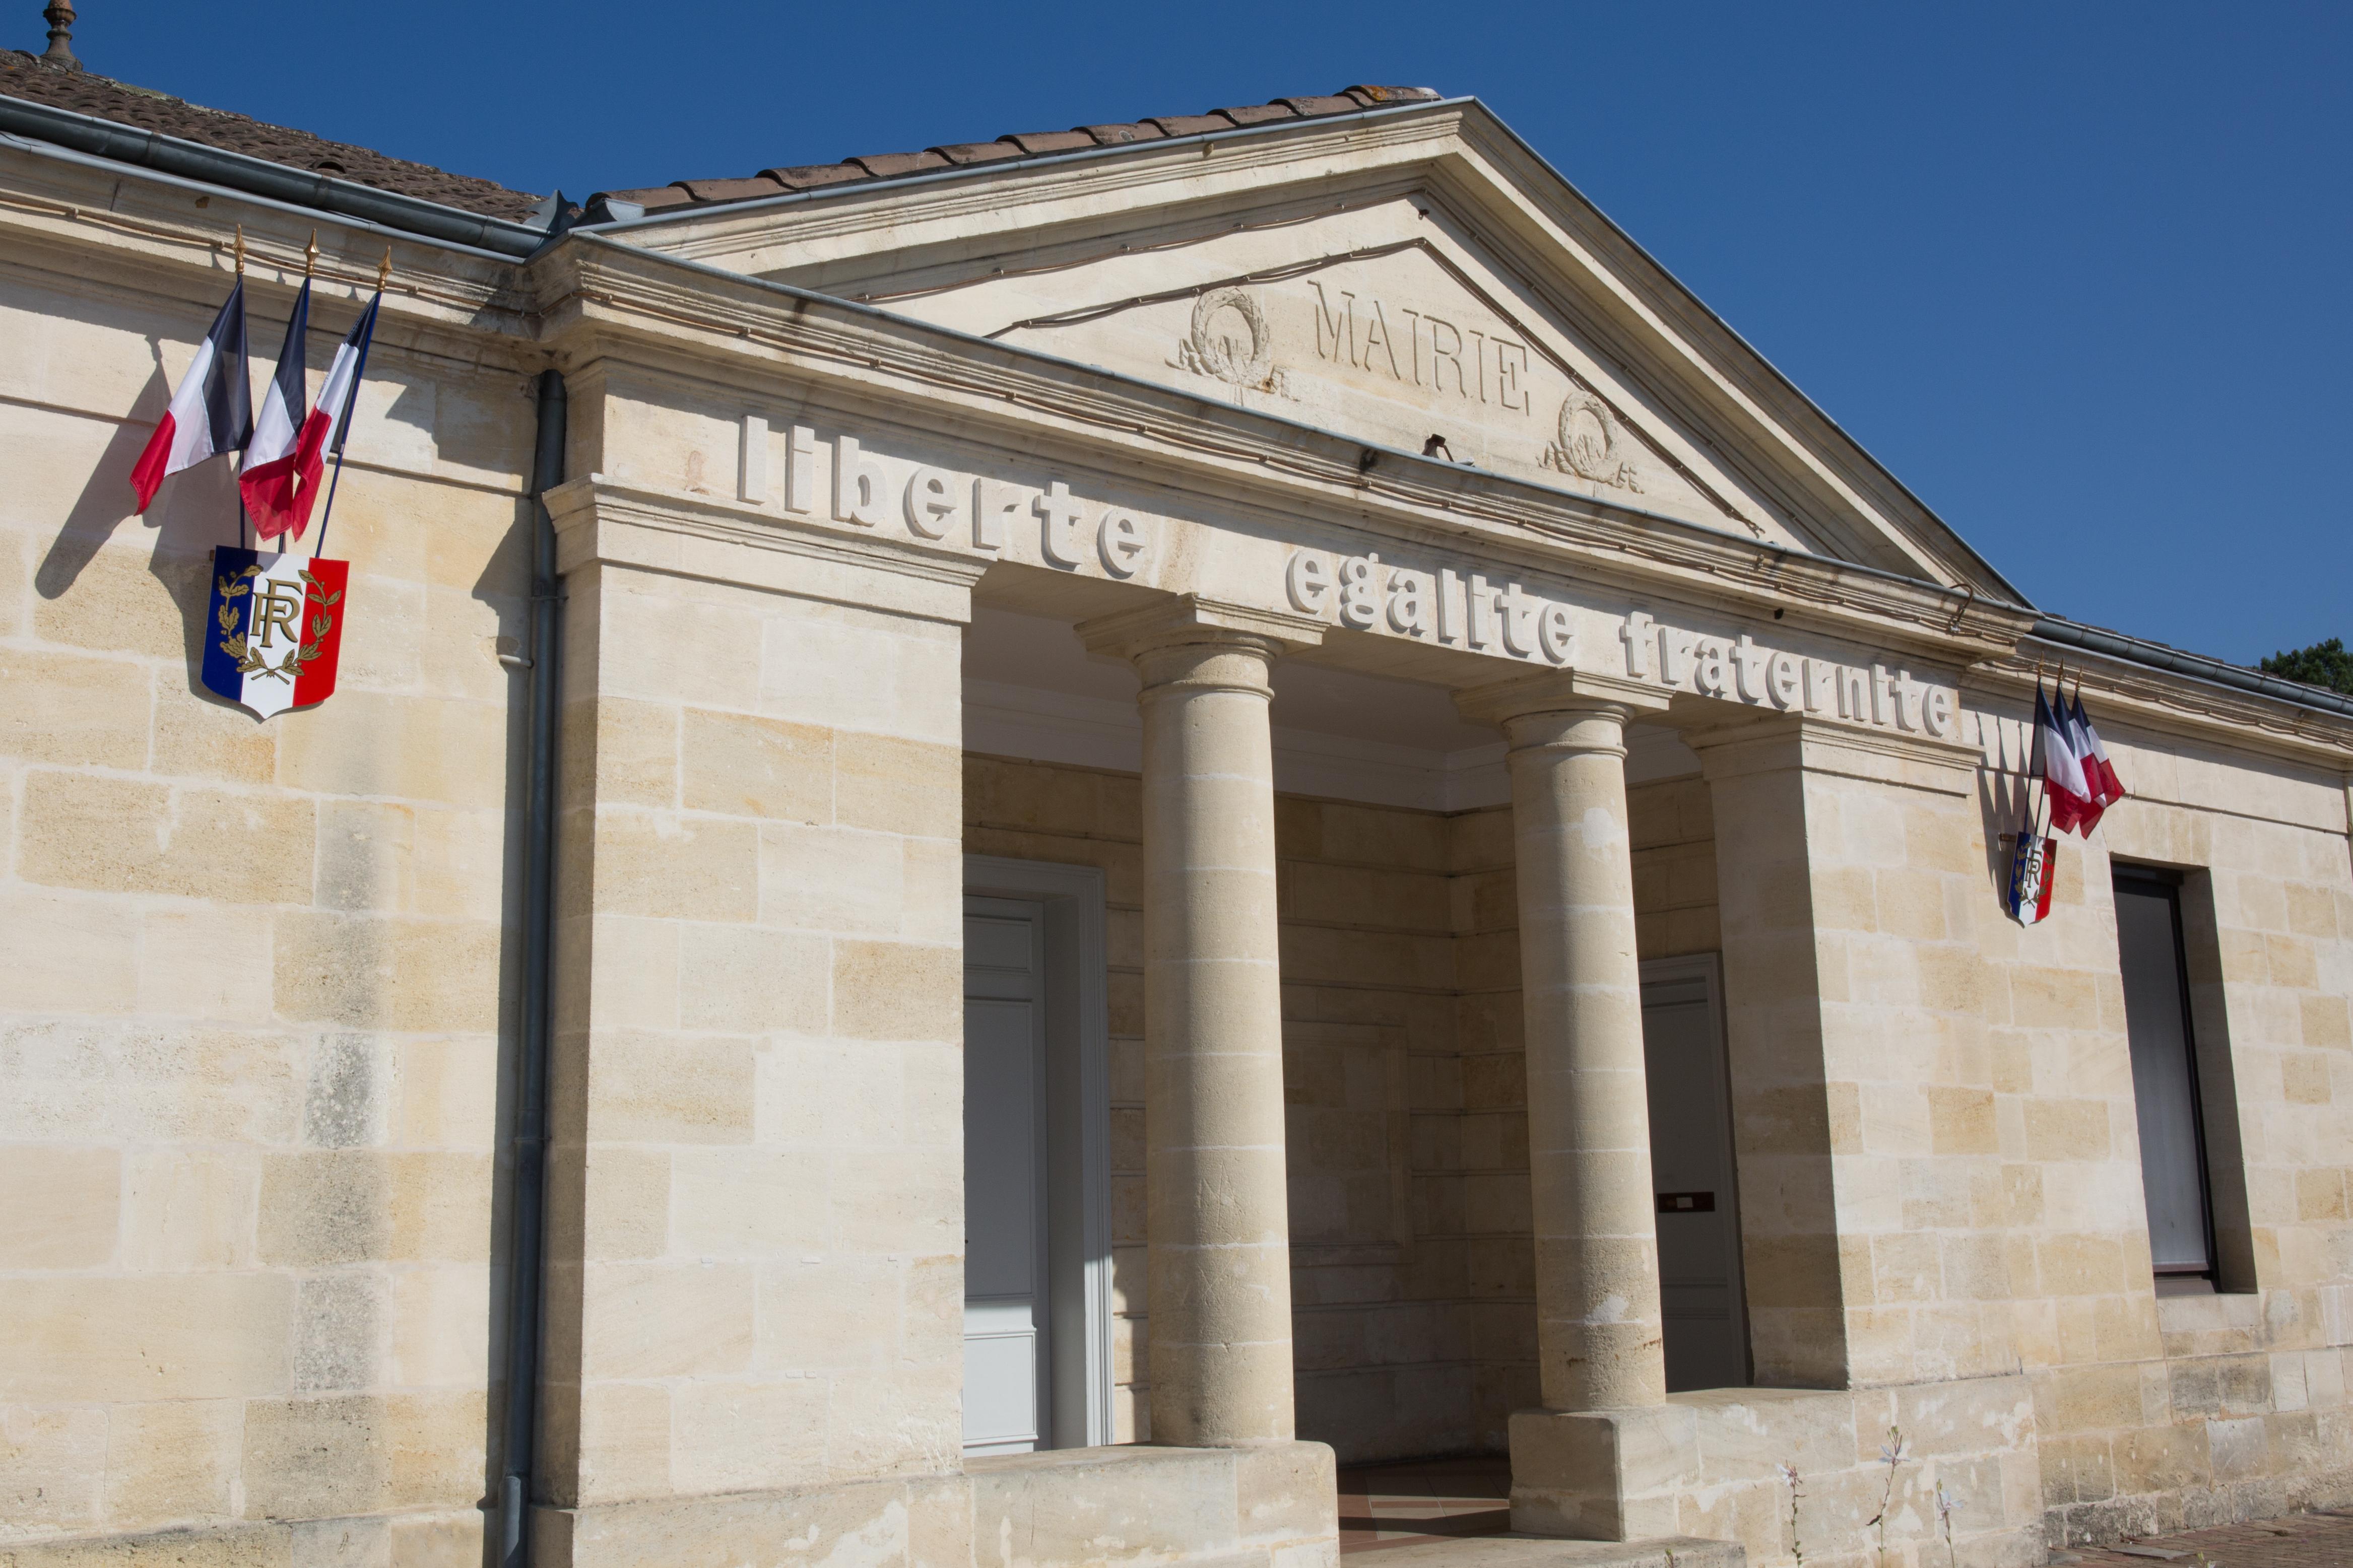 Mairie marseille annuaire web local - Chambre de commerce marseille adresse ...